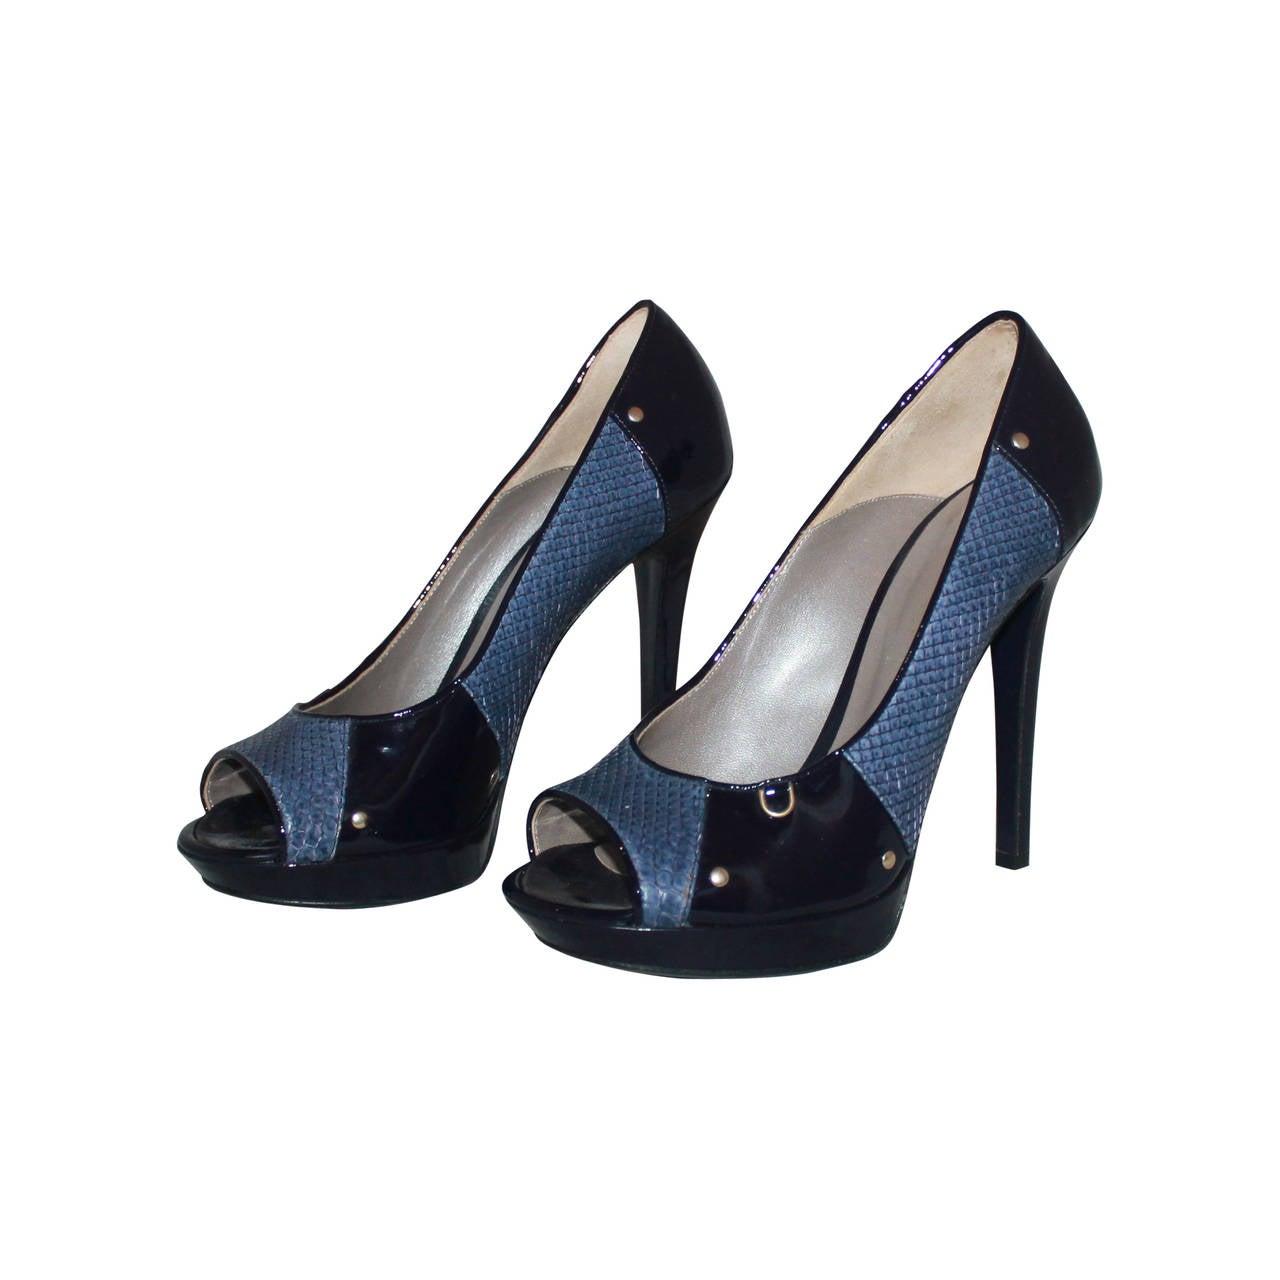 Versace Indigo Snake & Patent Peep-toe Pumps - 40